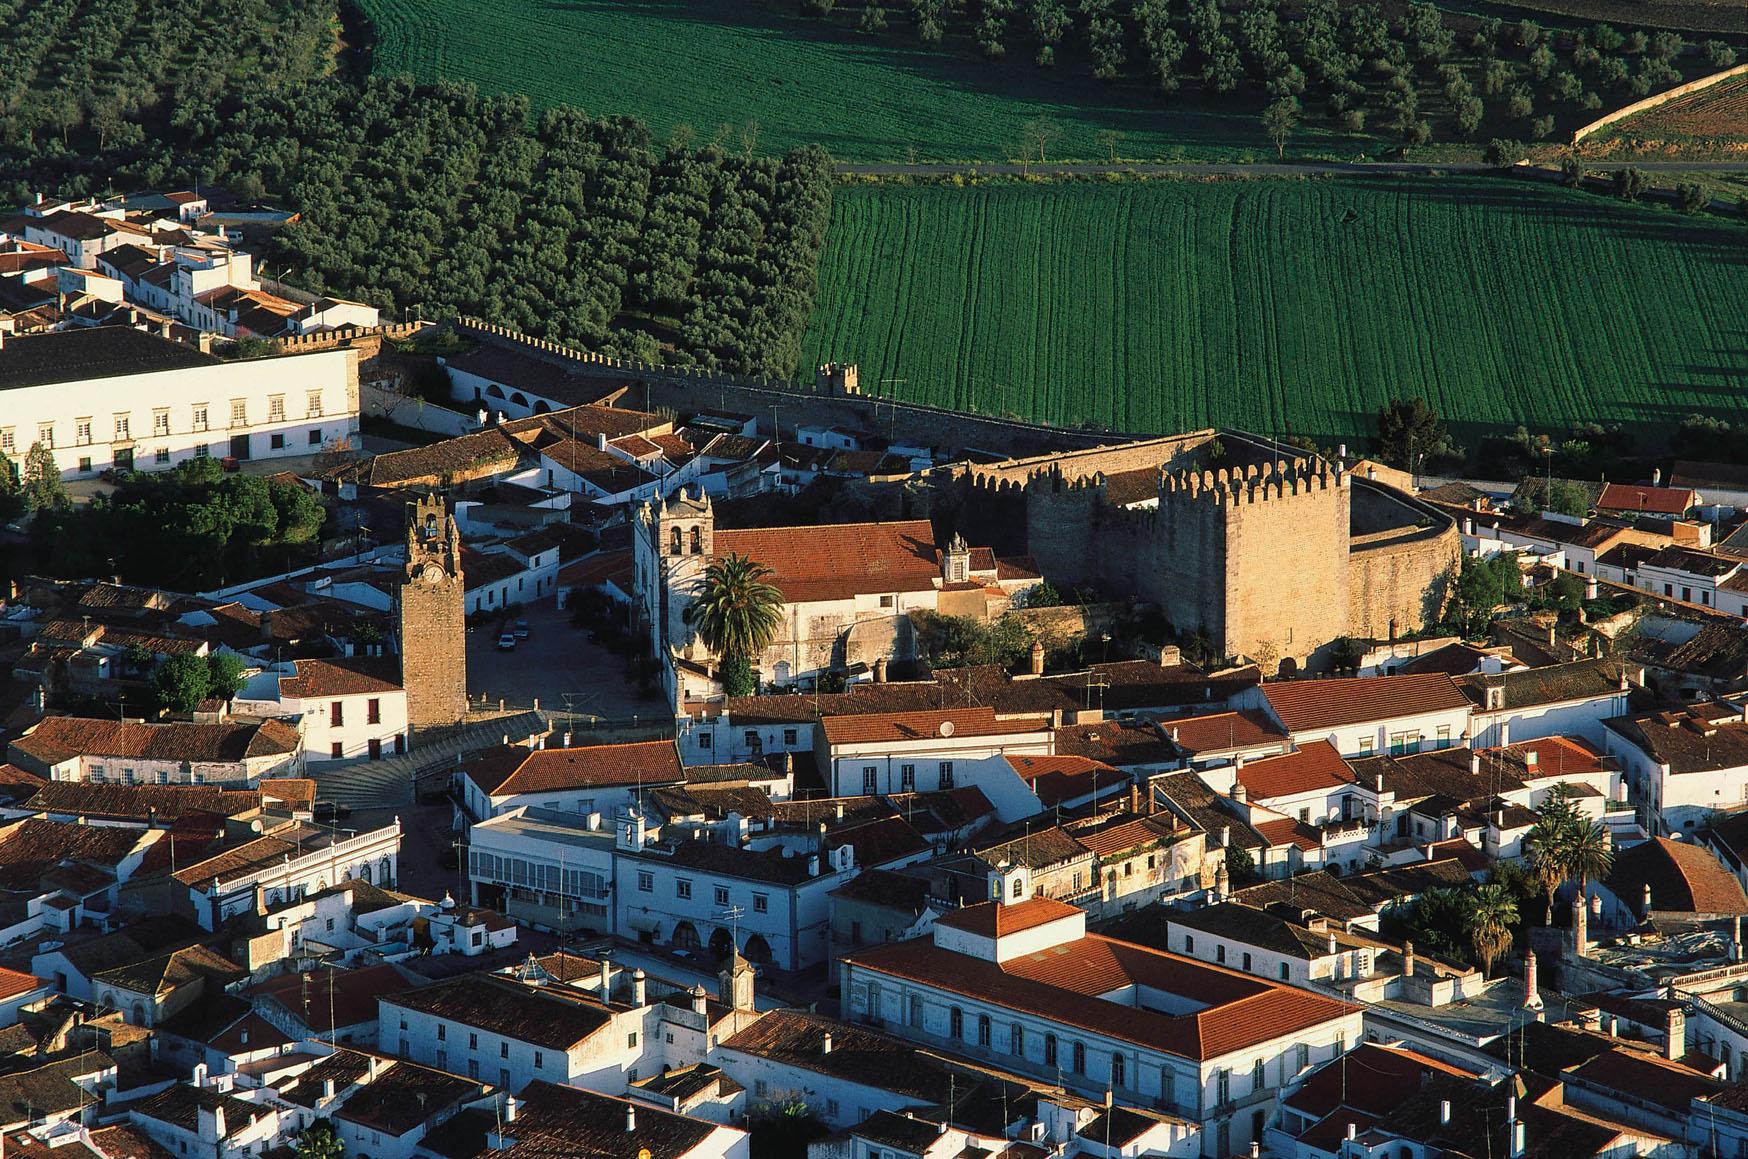 Vista aérea de Serpa - Foto: Antonio Sacchetti